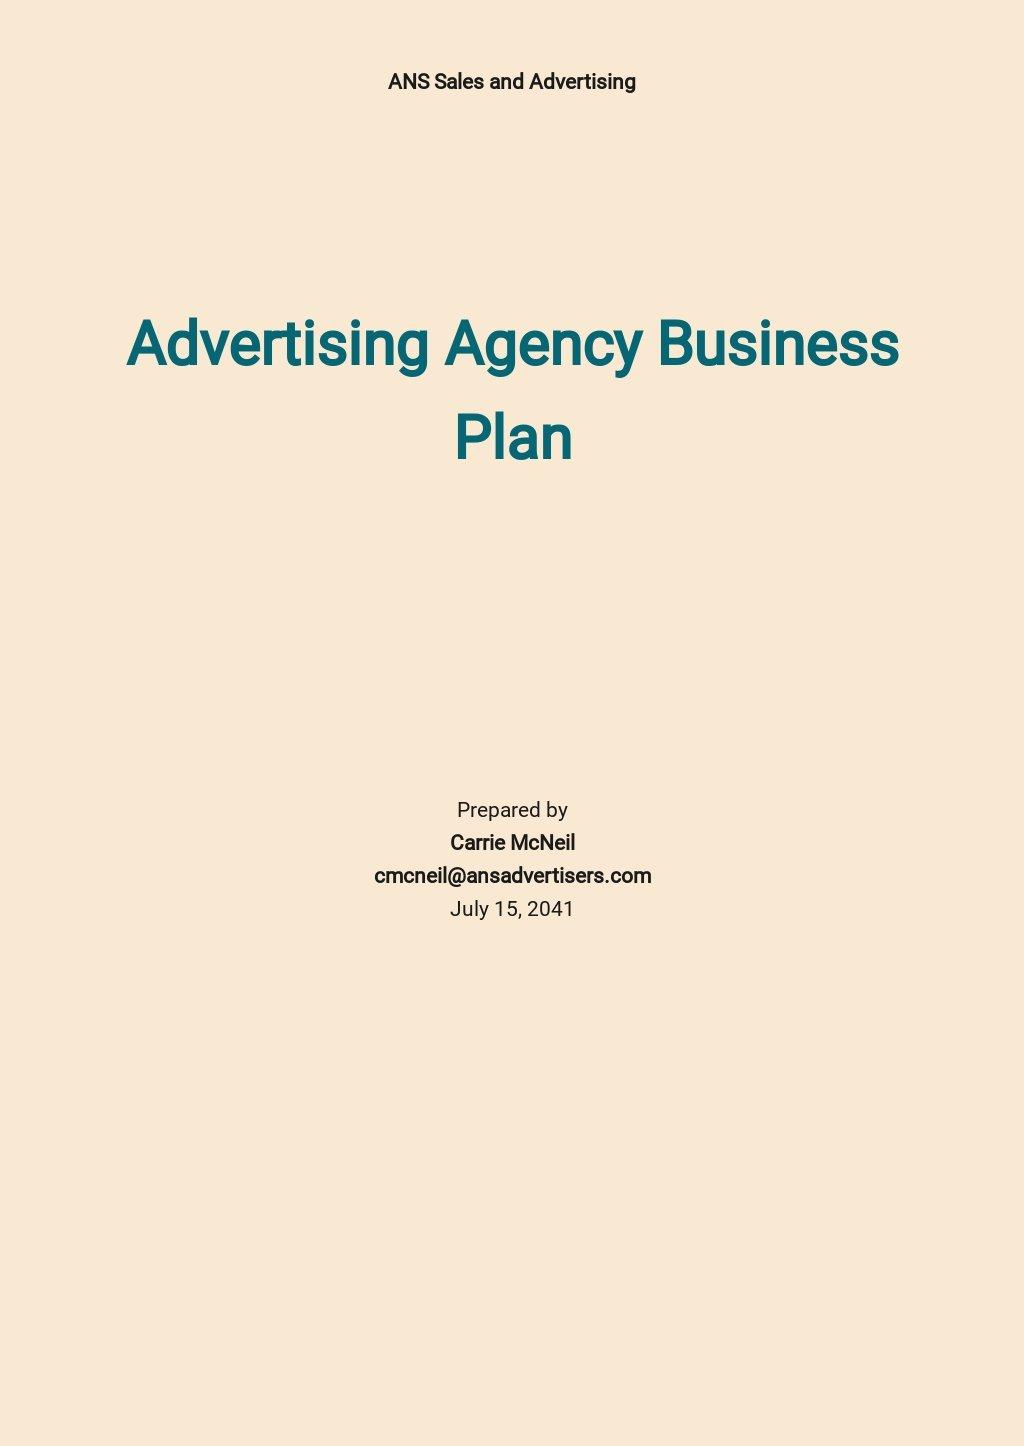 Advertising Agency Business Plan Template.jpe